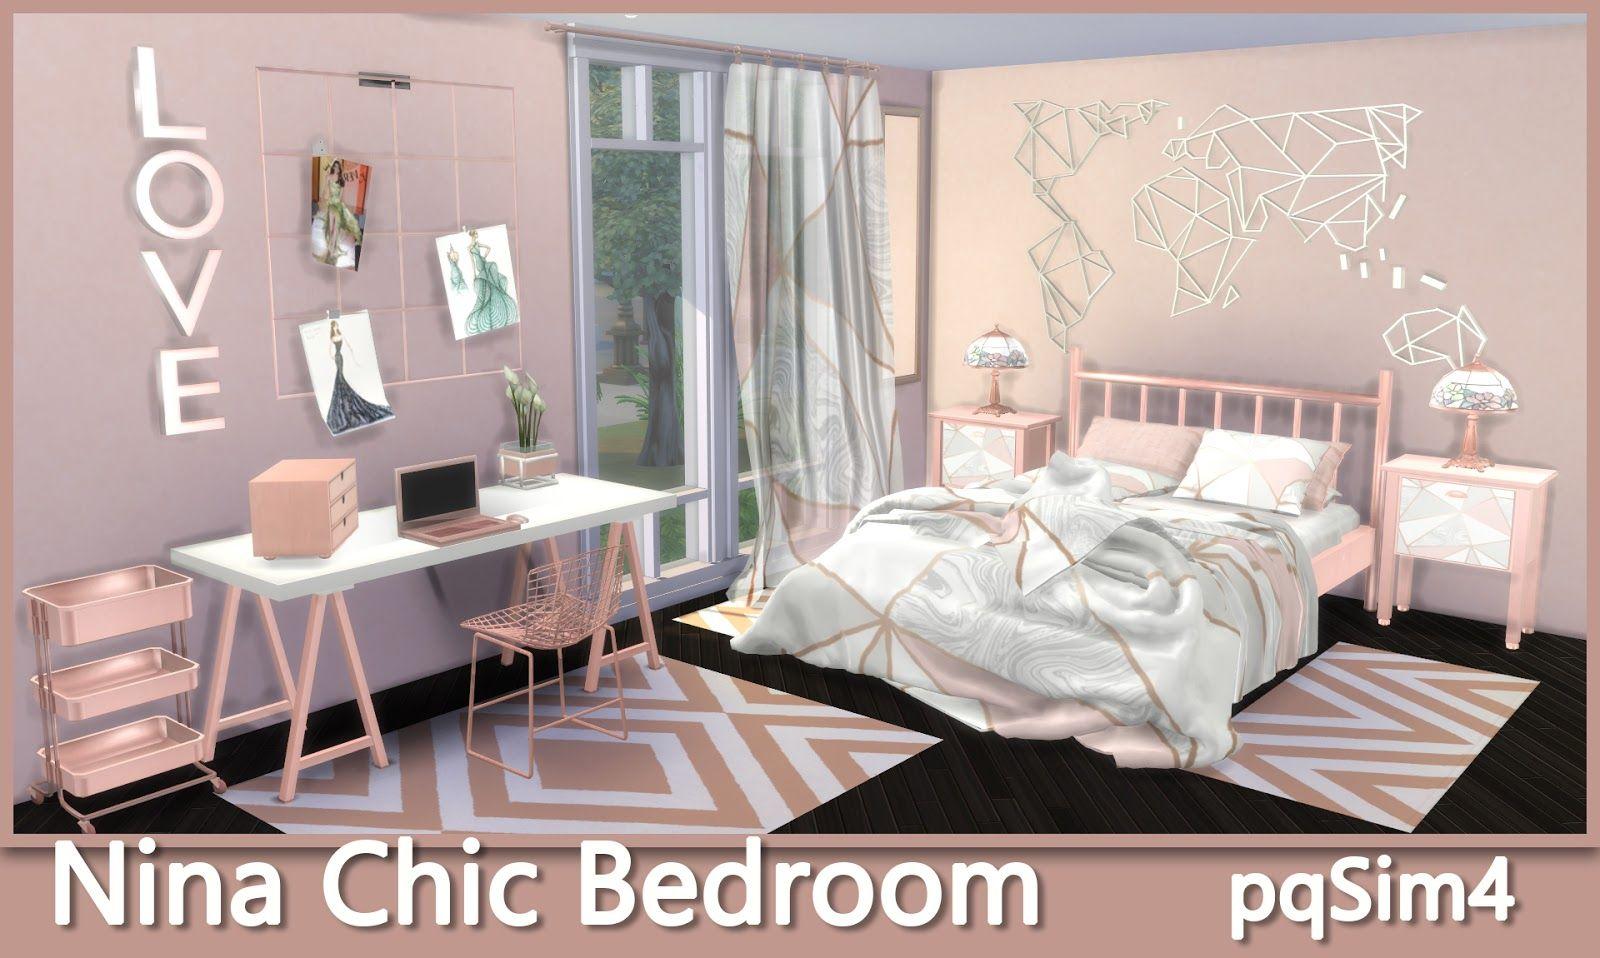 NINA CHIC BEDROOM by pqsim4 Sims 4 cc möbel, Sims 4